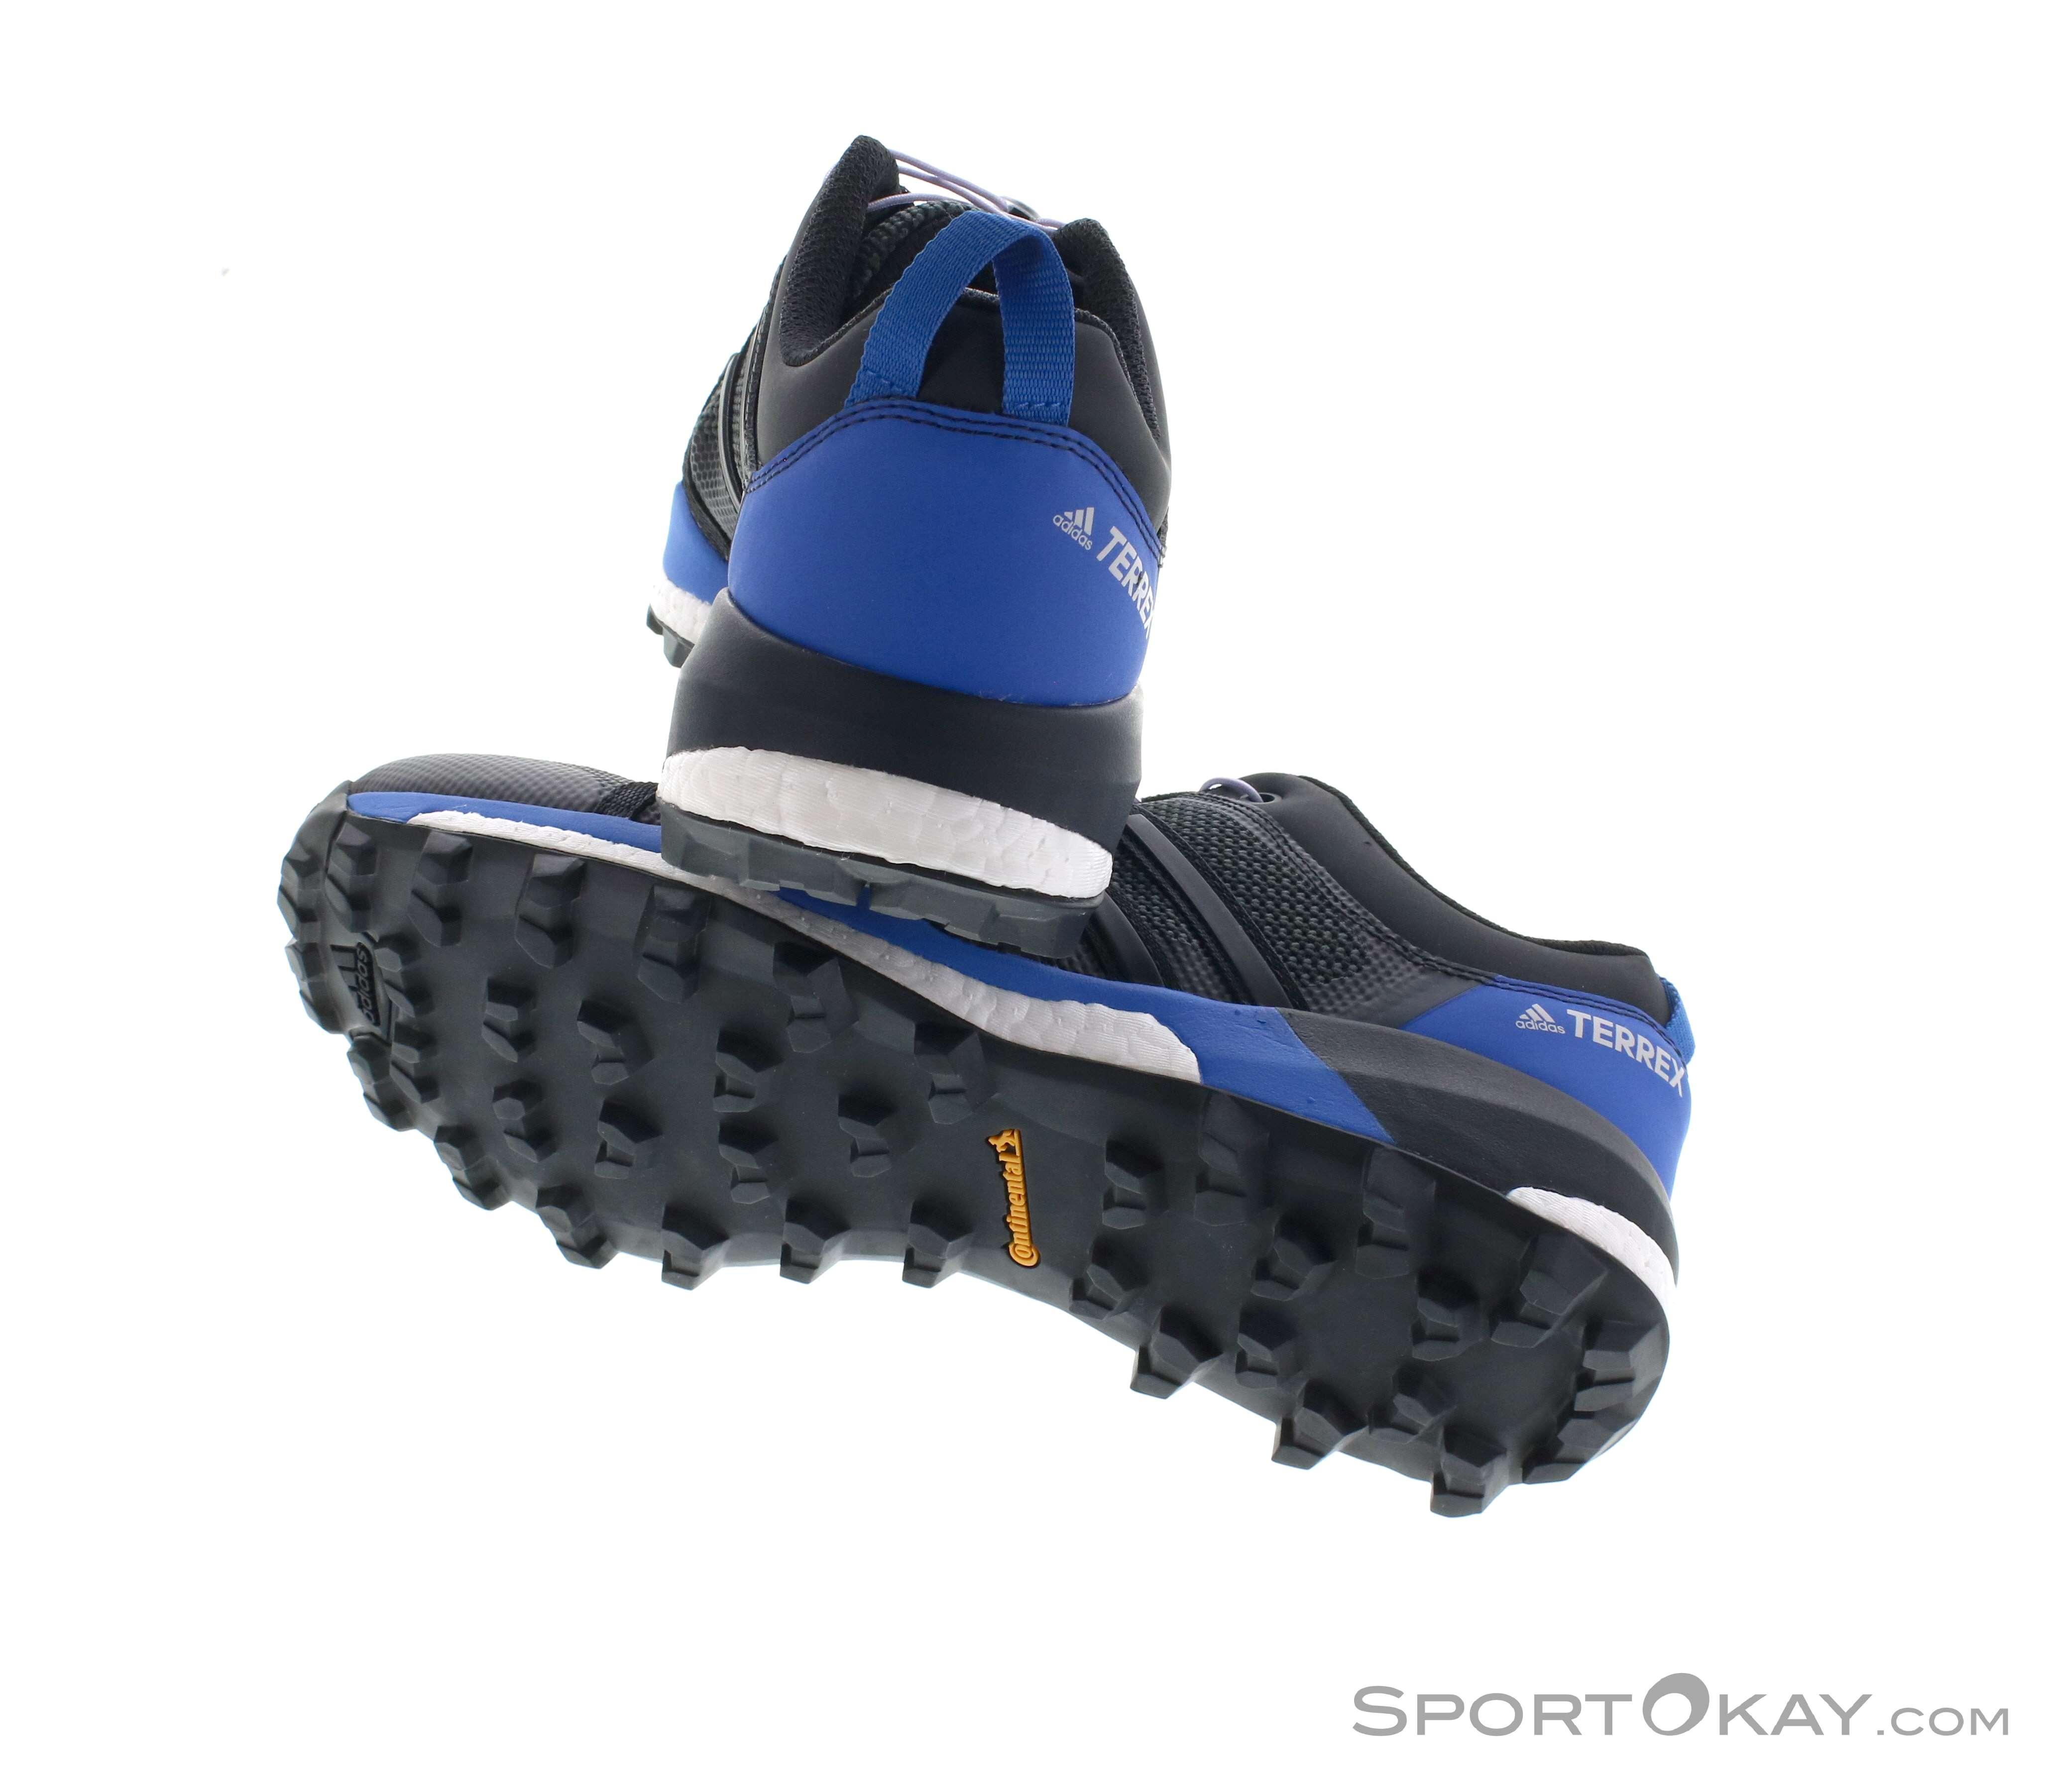 best service 45113 21e61 adidas Terrex Skychaser Uomo Scarpe da Trail Running, adidas, Nero, , Uomo,